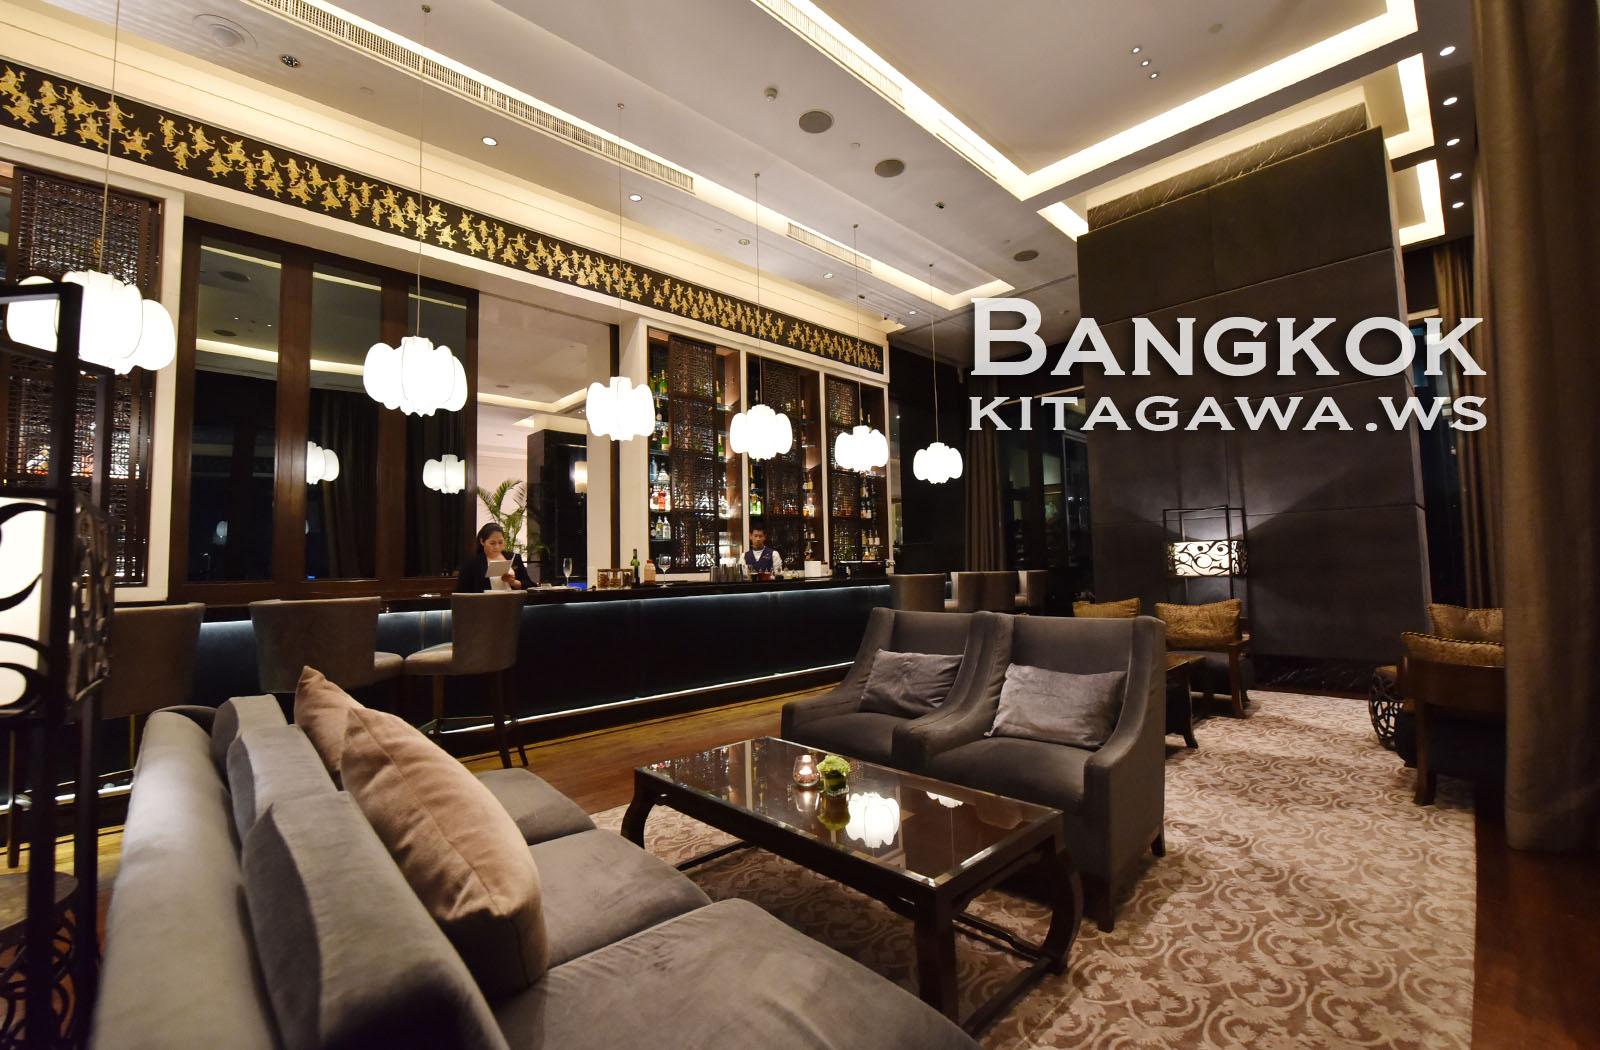 The St. Regis Bar Bangkok